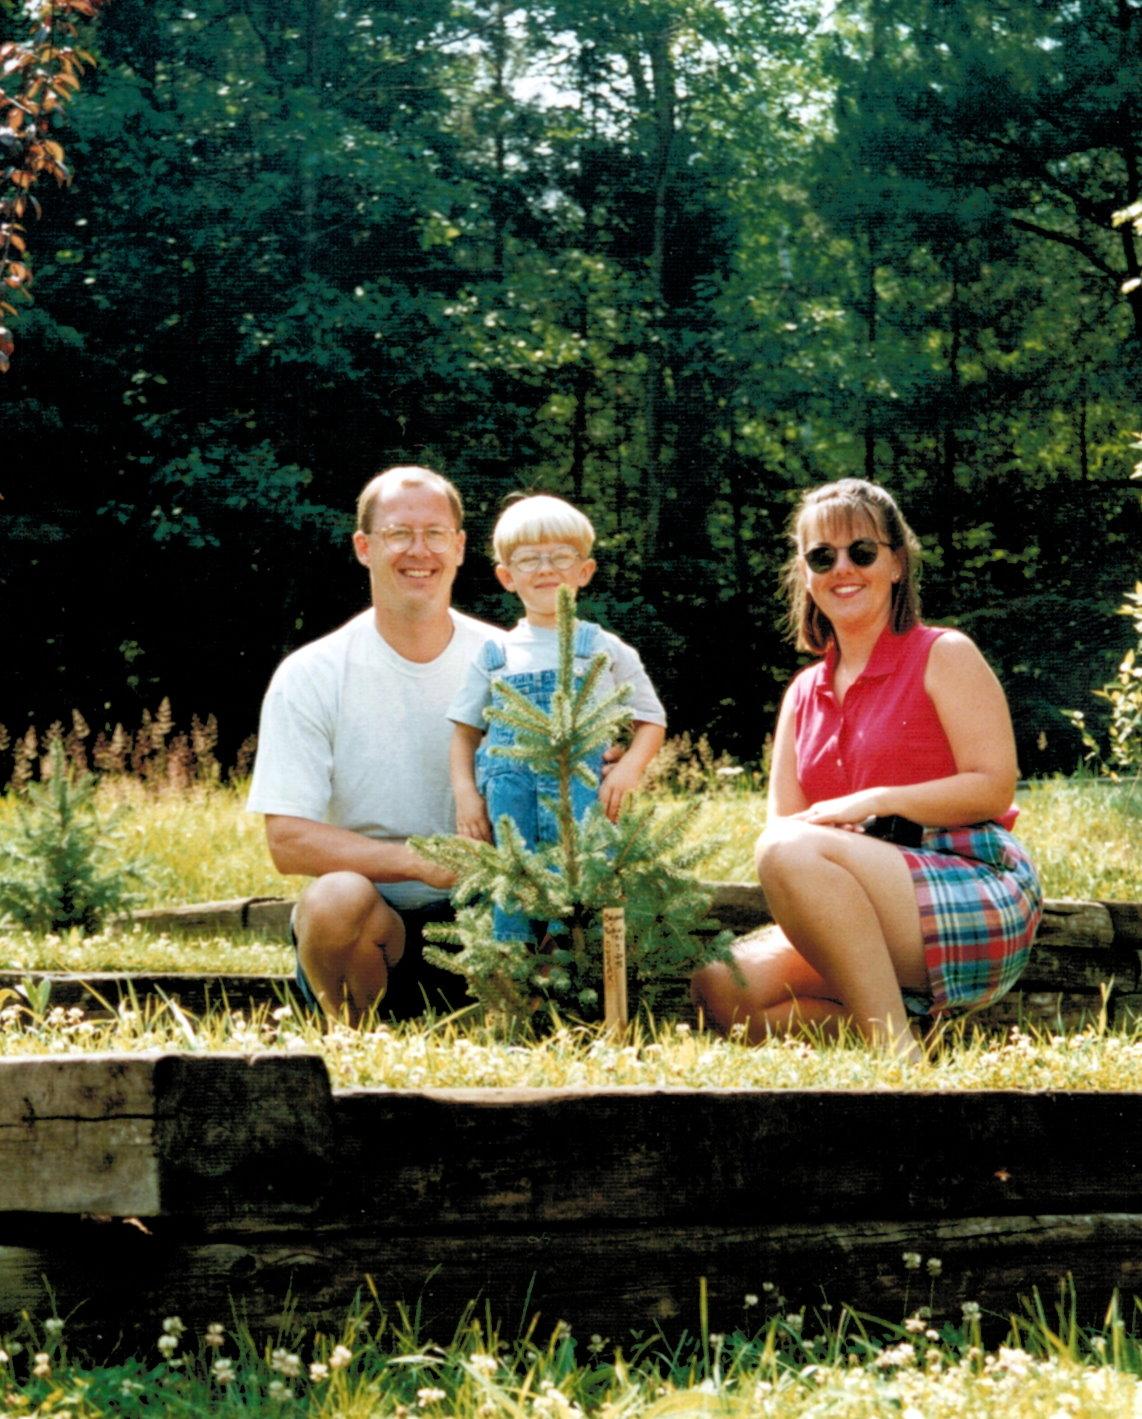 Bryan, Robin and BJ's tree